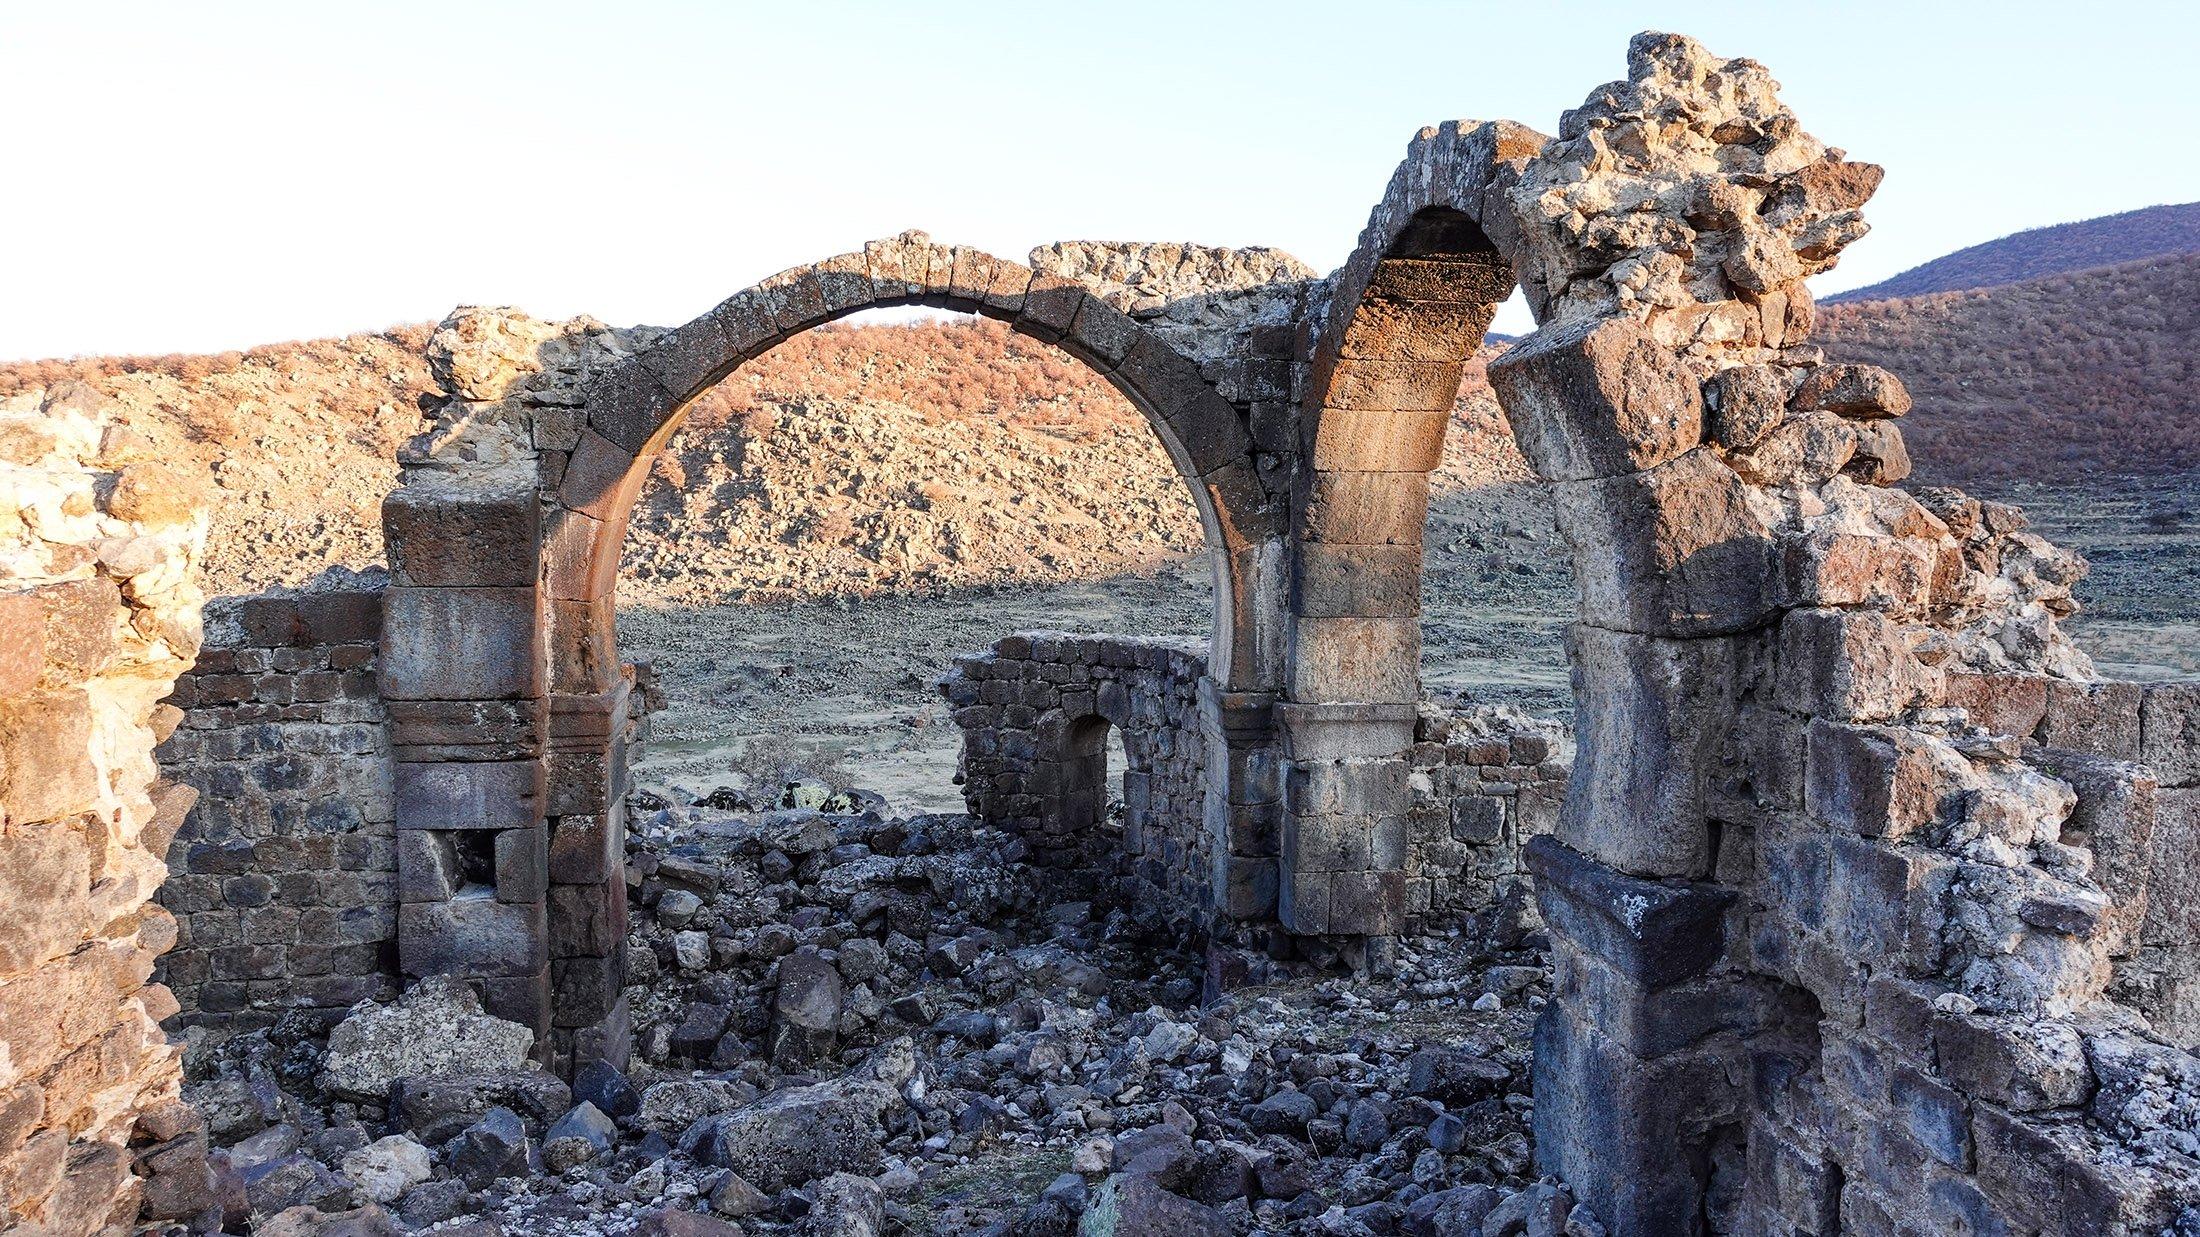 The Vaulted Church at Mokissos. (Photo by Argun Konuk)